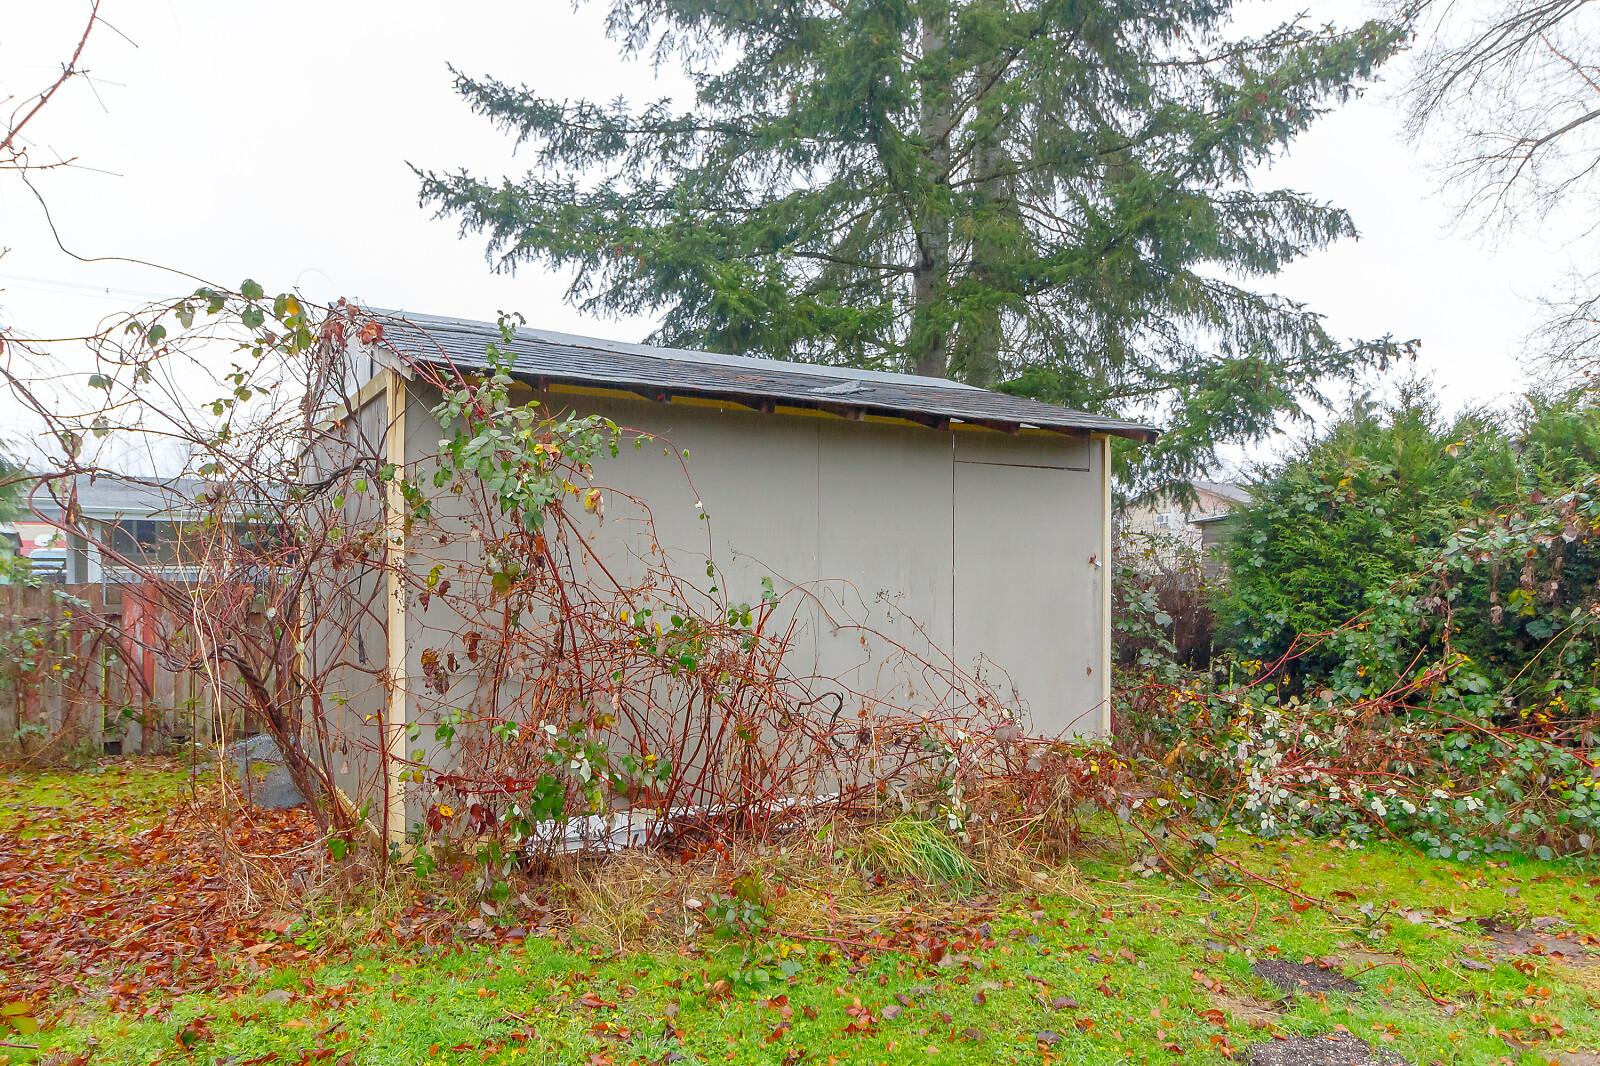 2519 Lewis St, Duncan, British Columbia  V9L 2Z2 - Photo 20 - 861929